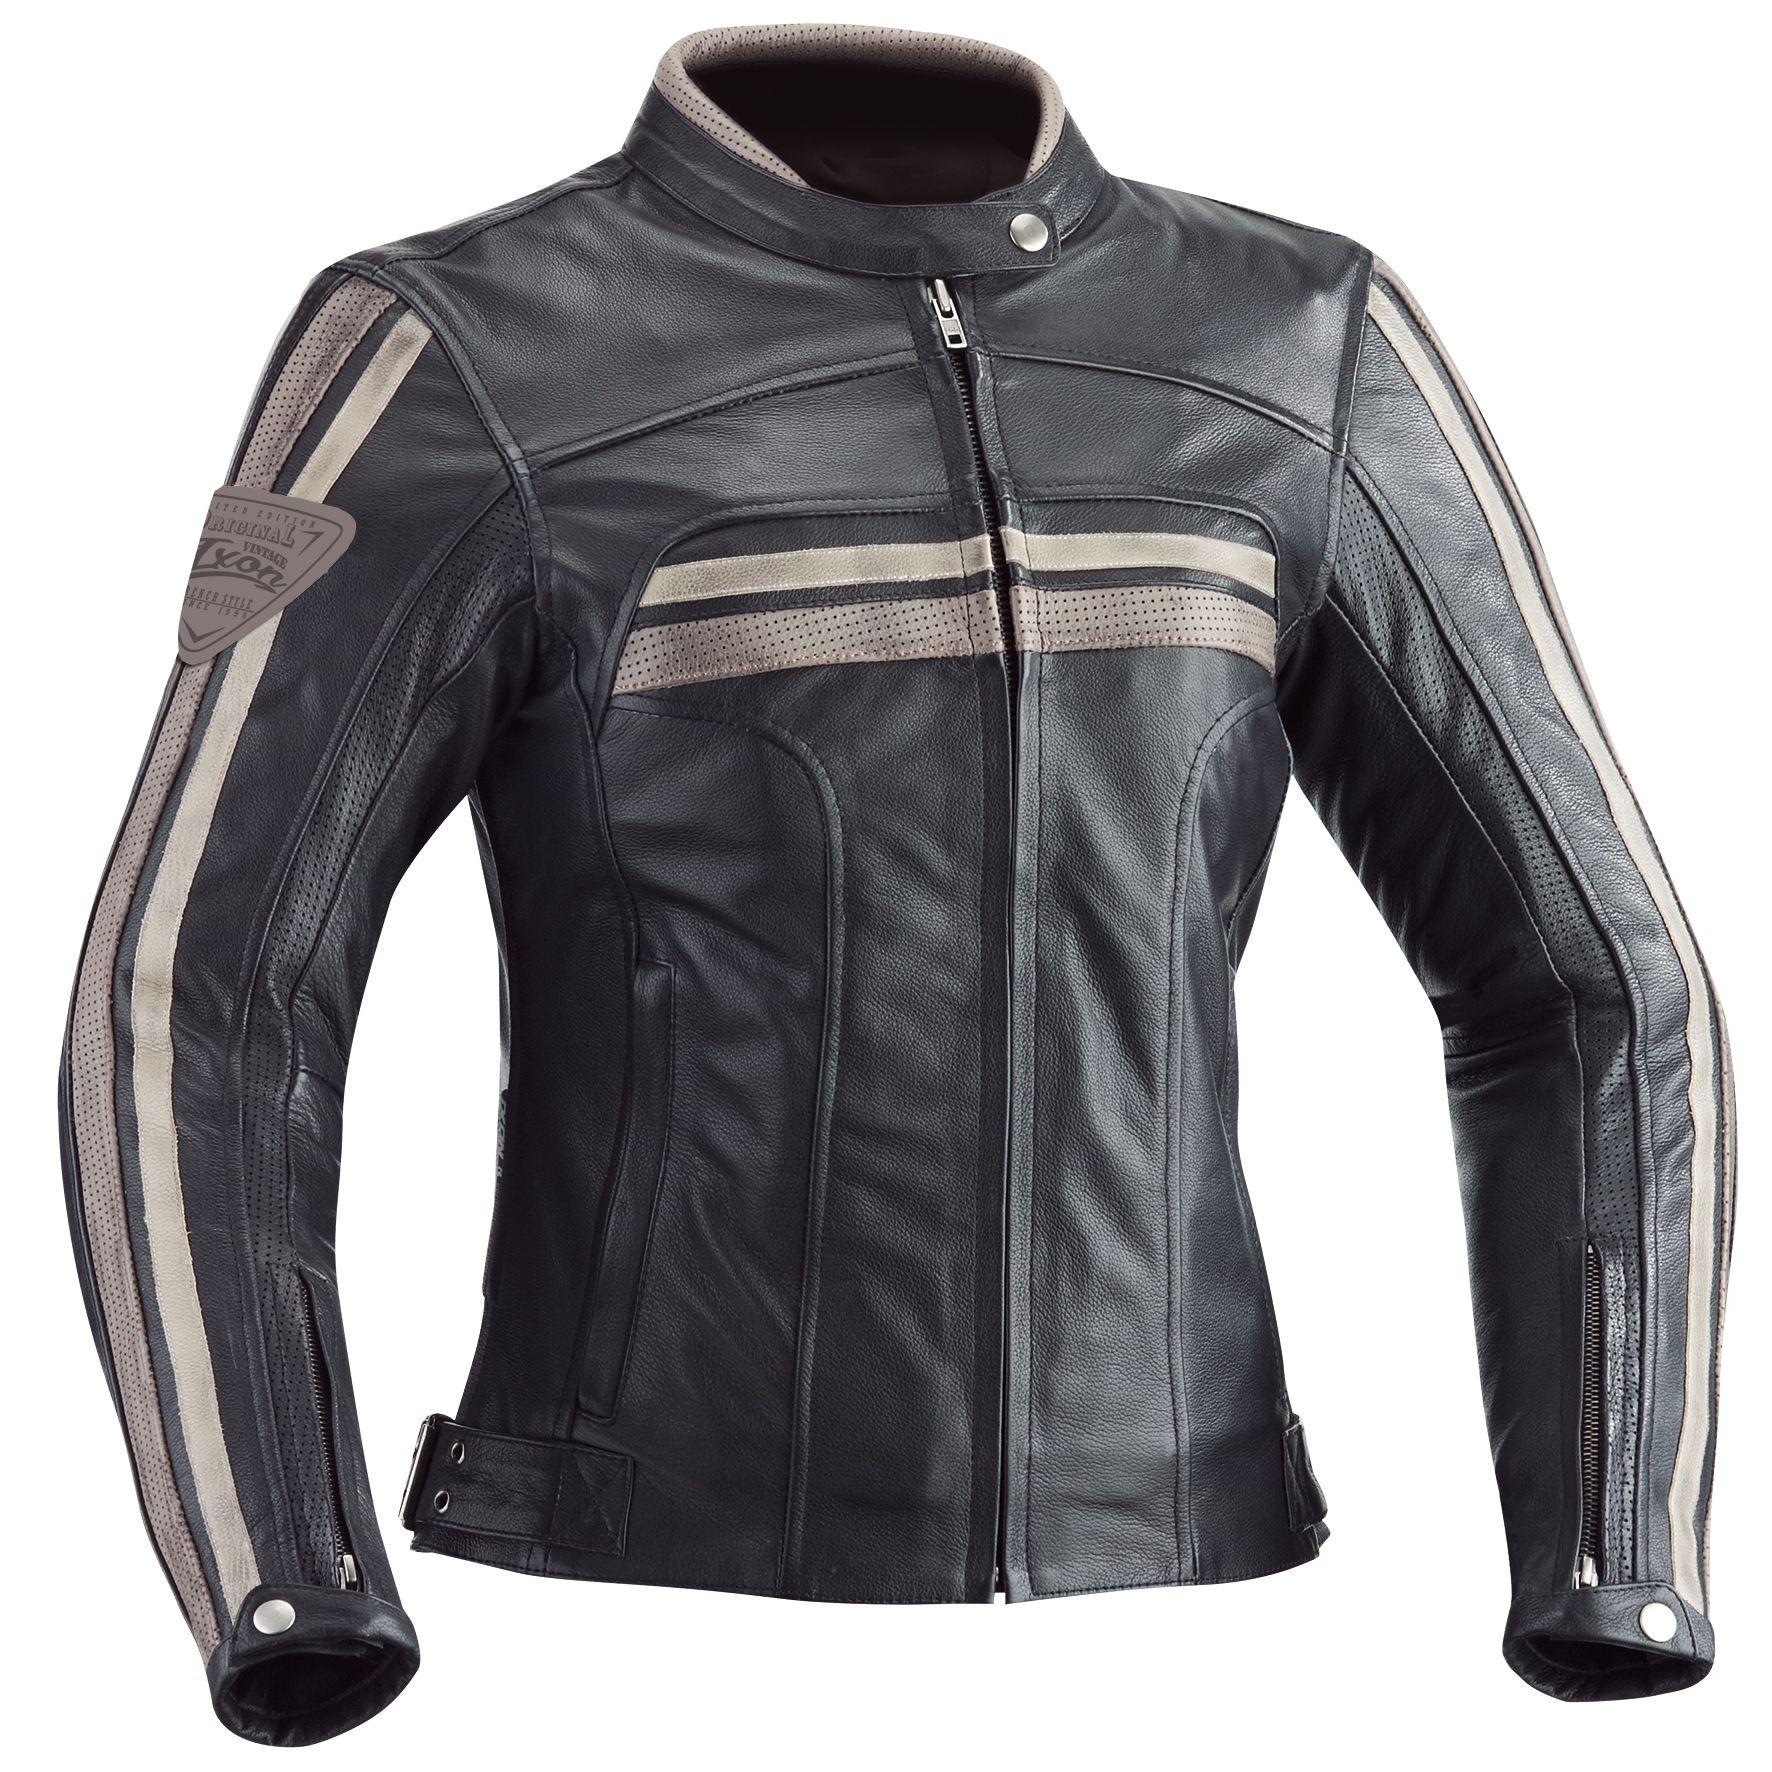 Ixon woman leather jacket Heroes black beige